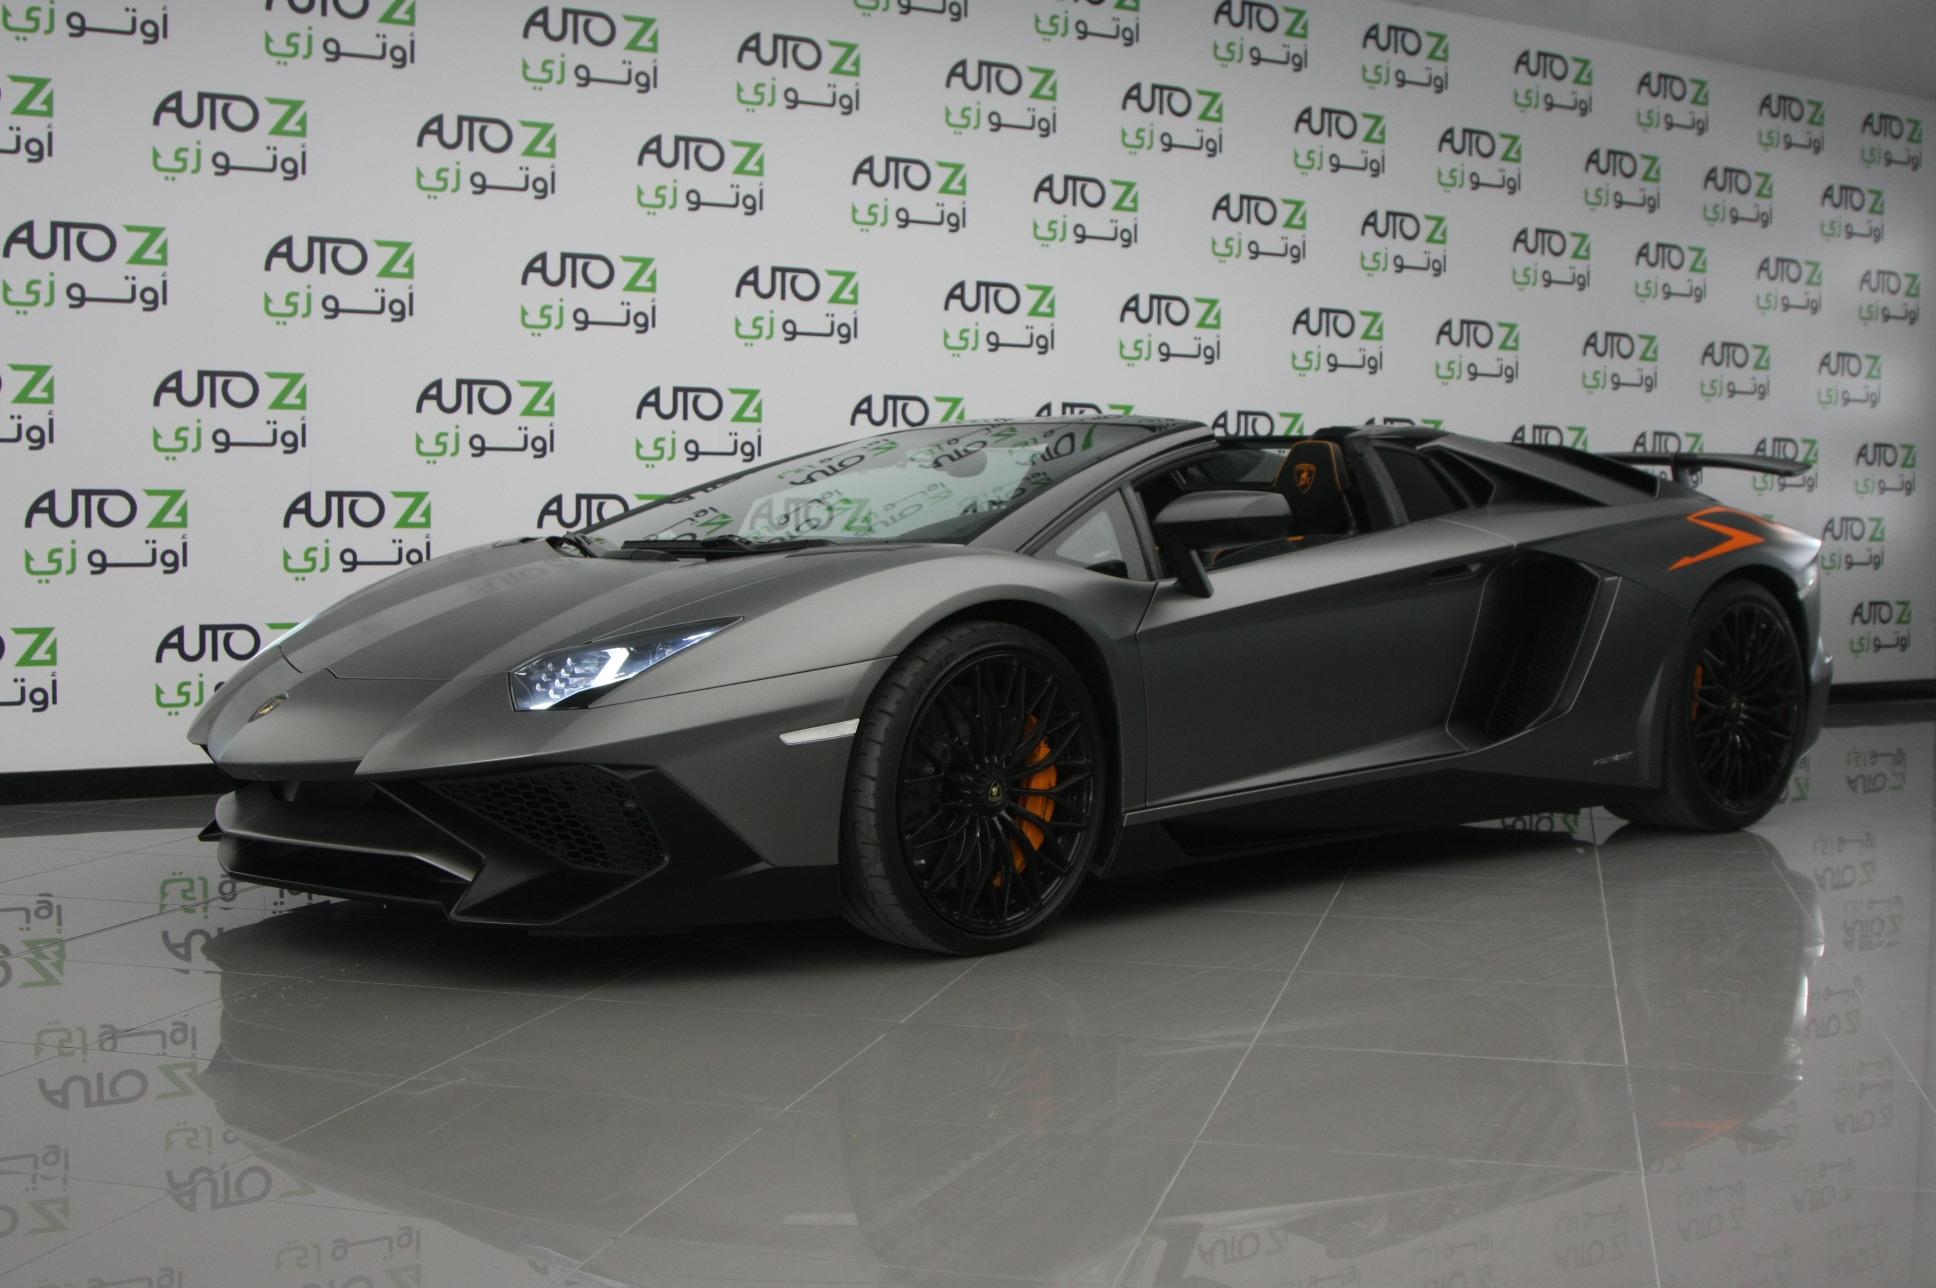 lamborghini cars in qatar best lamborghini cars deal with autoz. Black Bedroom Furniture Sets. Home Design Ideas